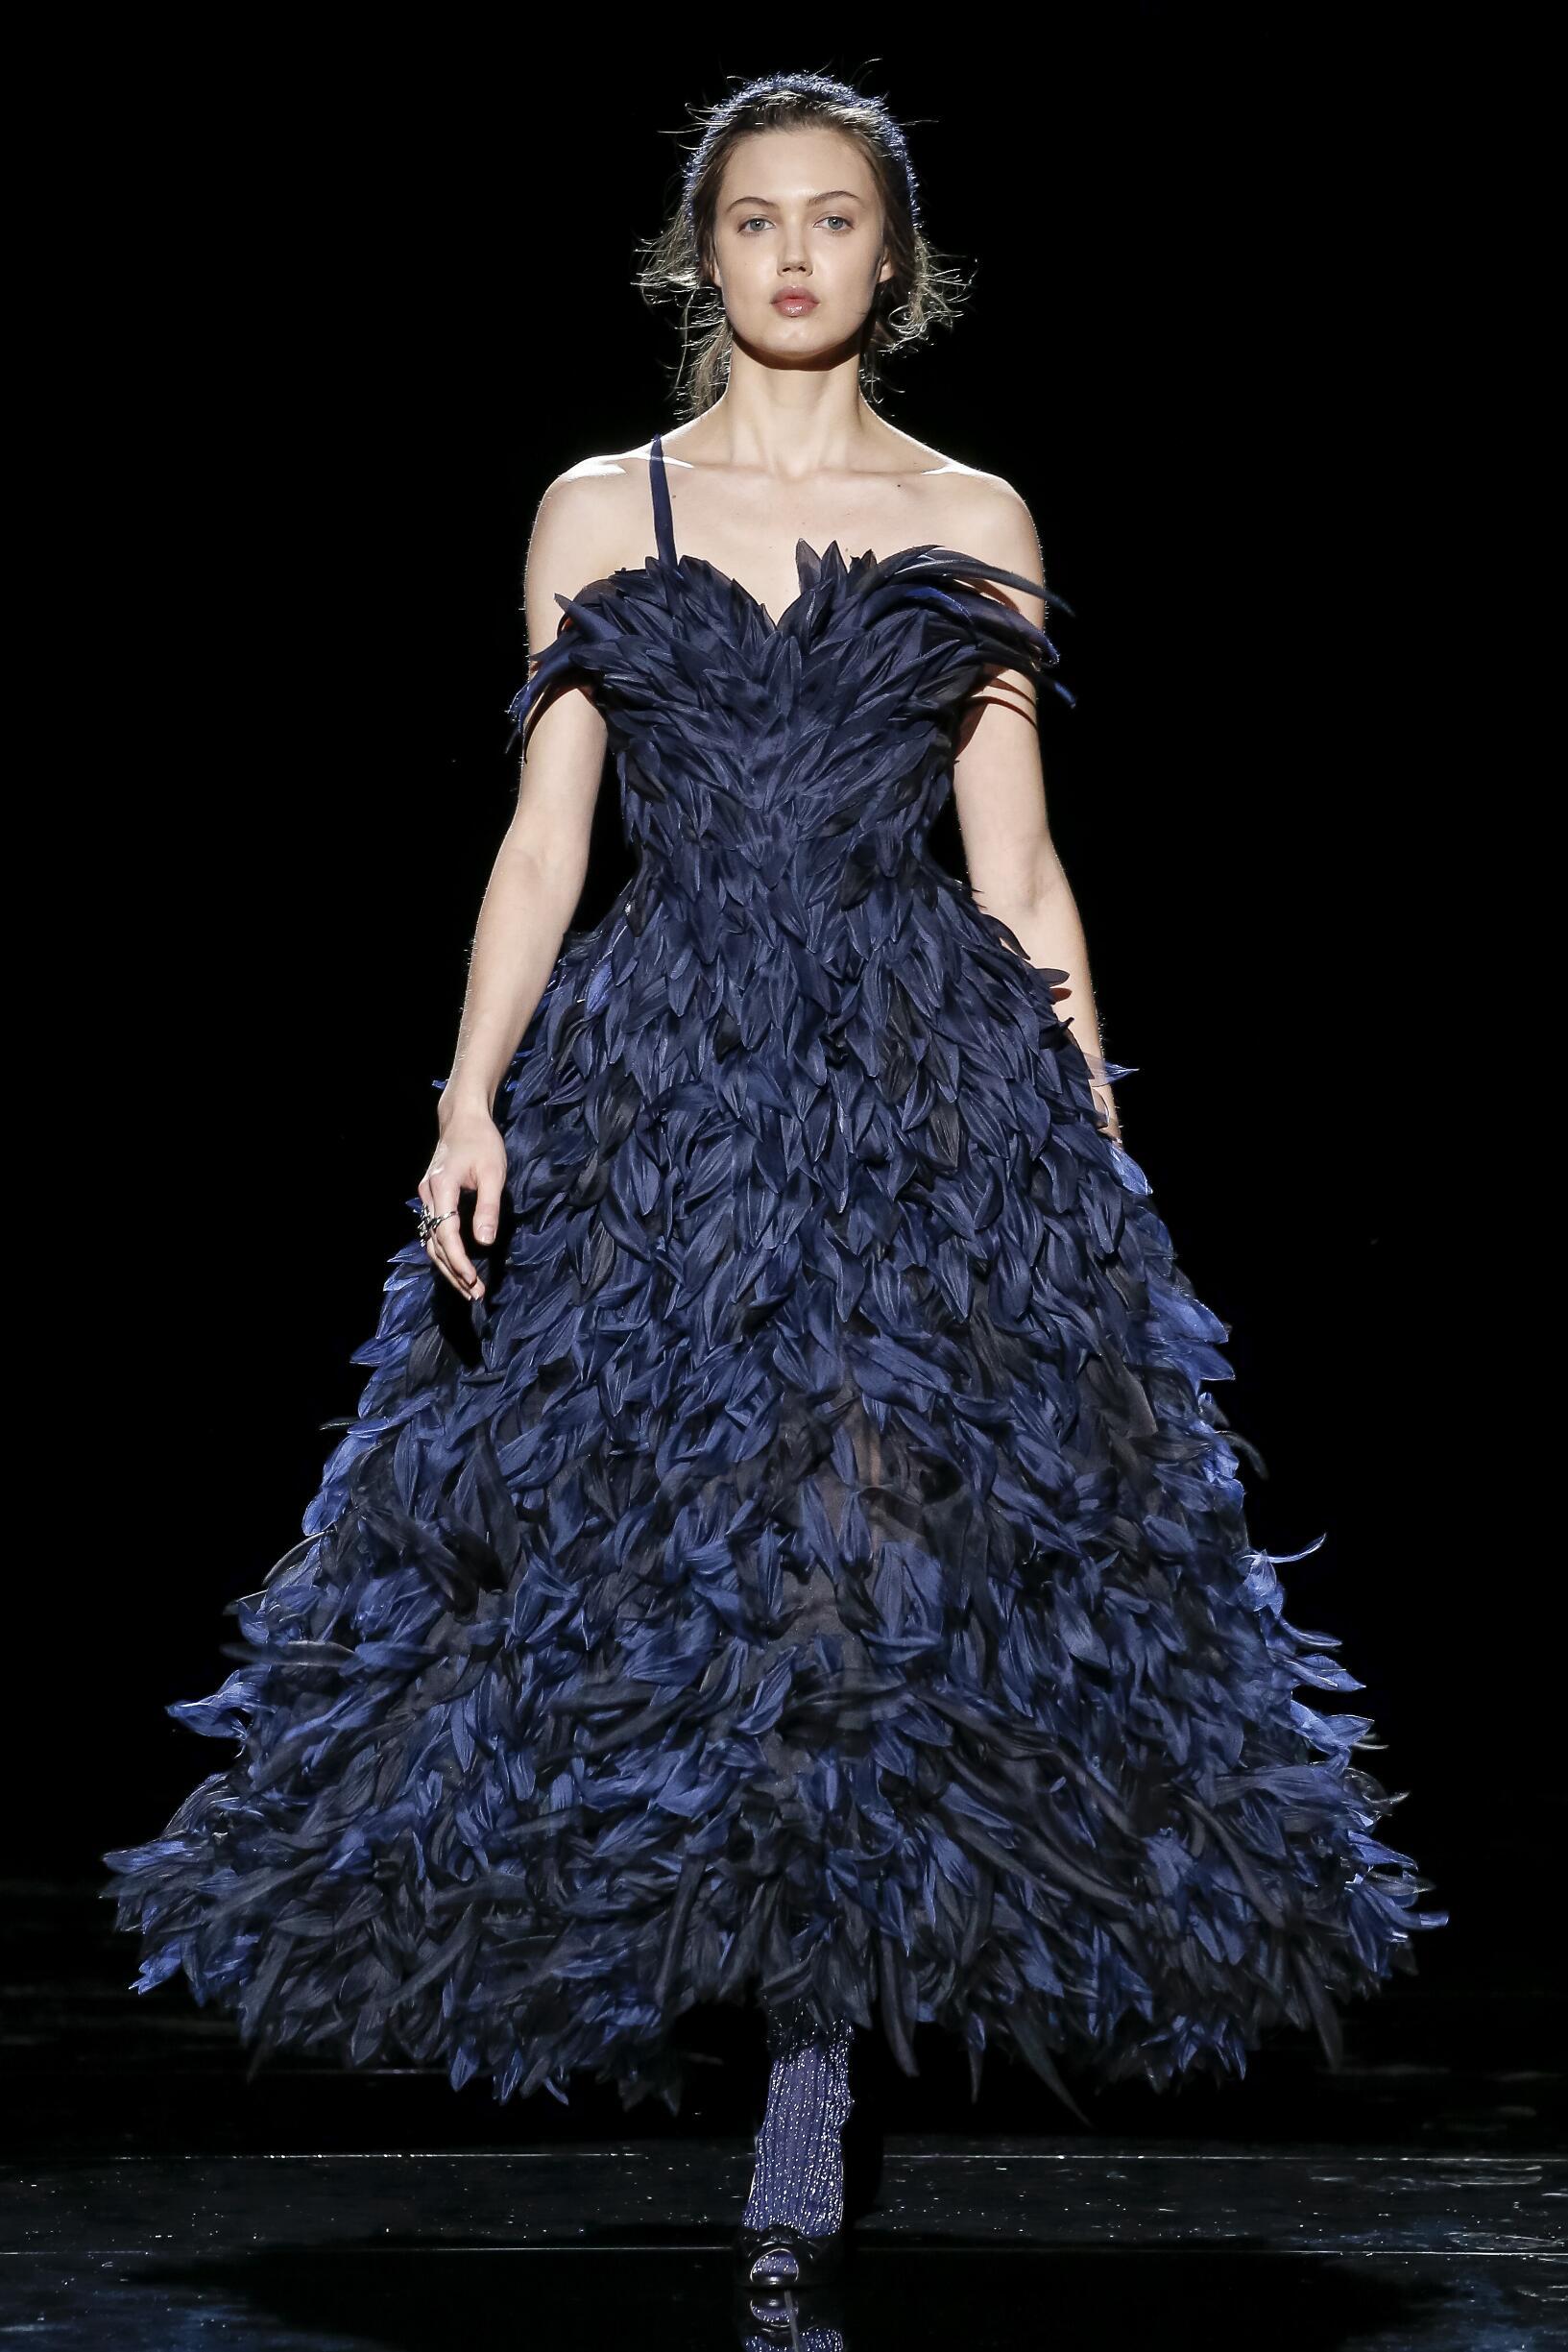 Catwalk Marc Jacobs Women Fashion Show Winter 2019